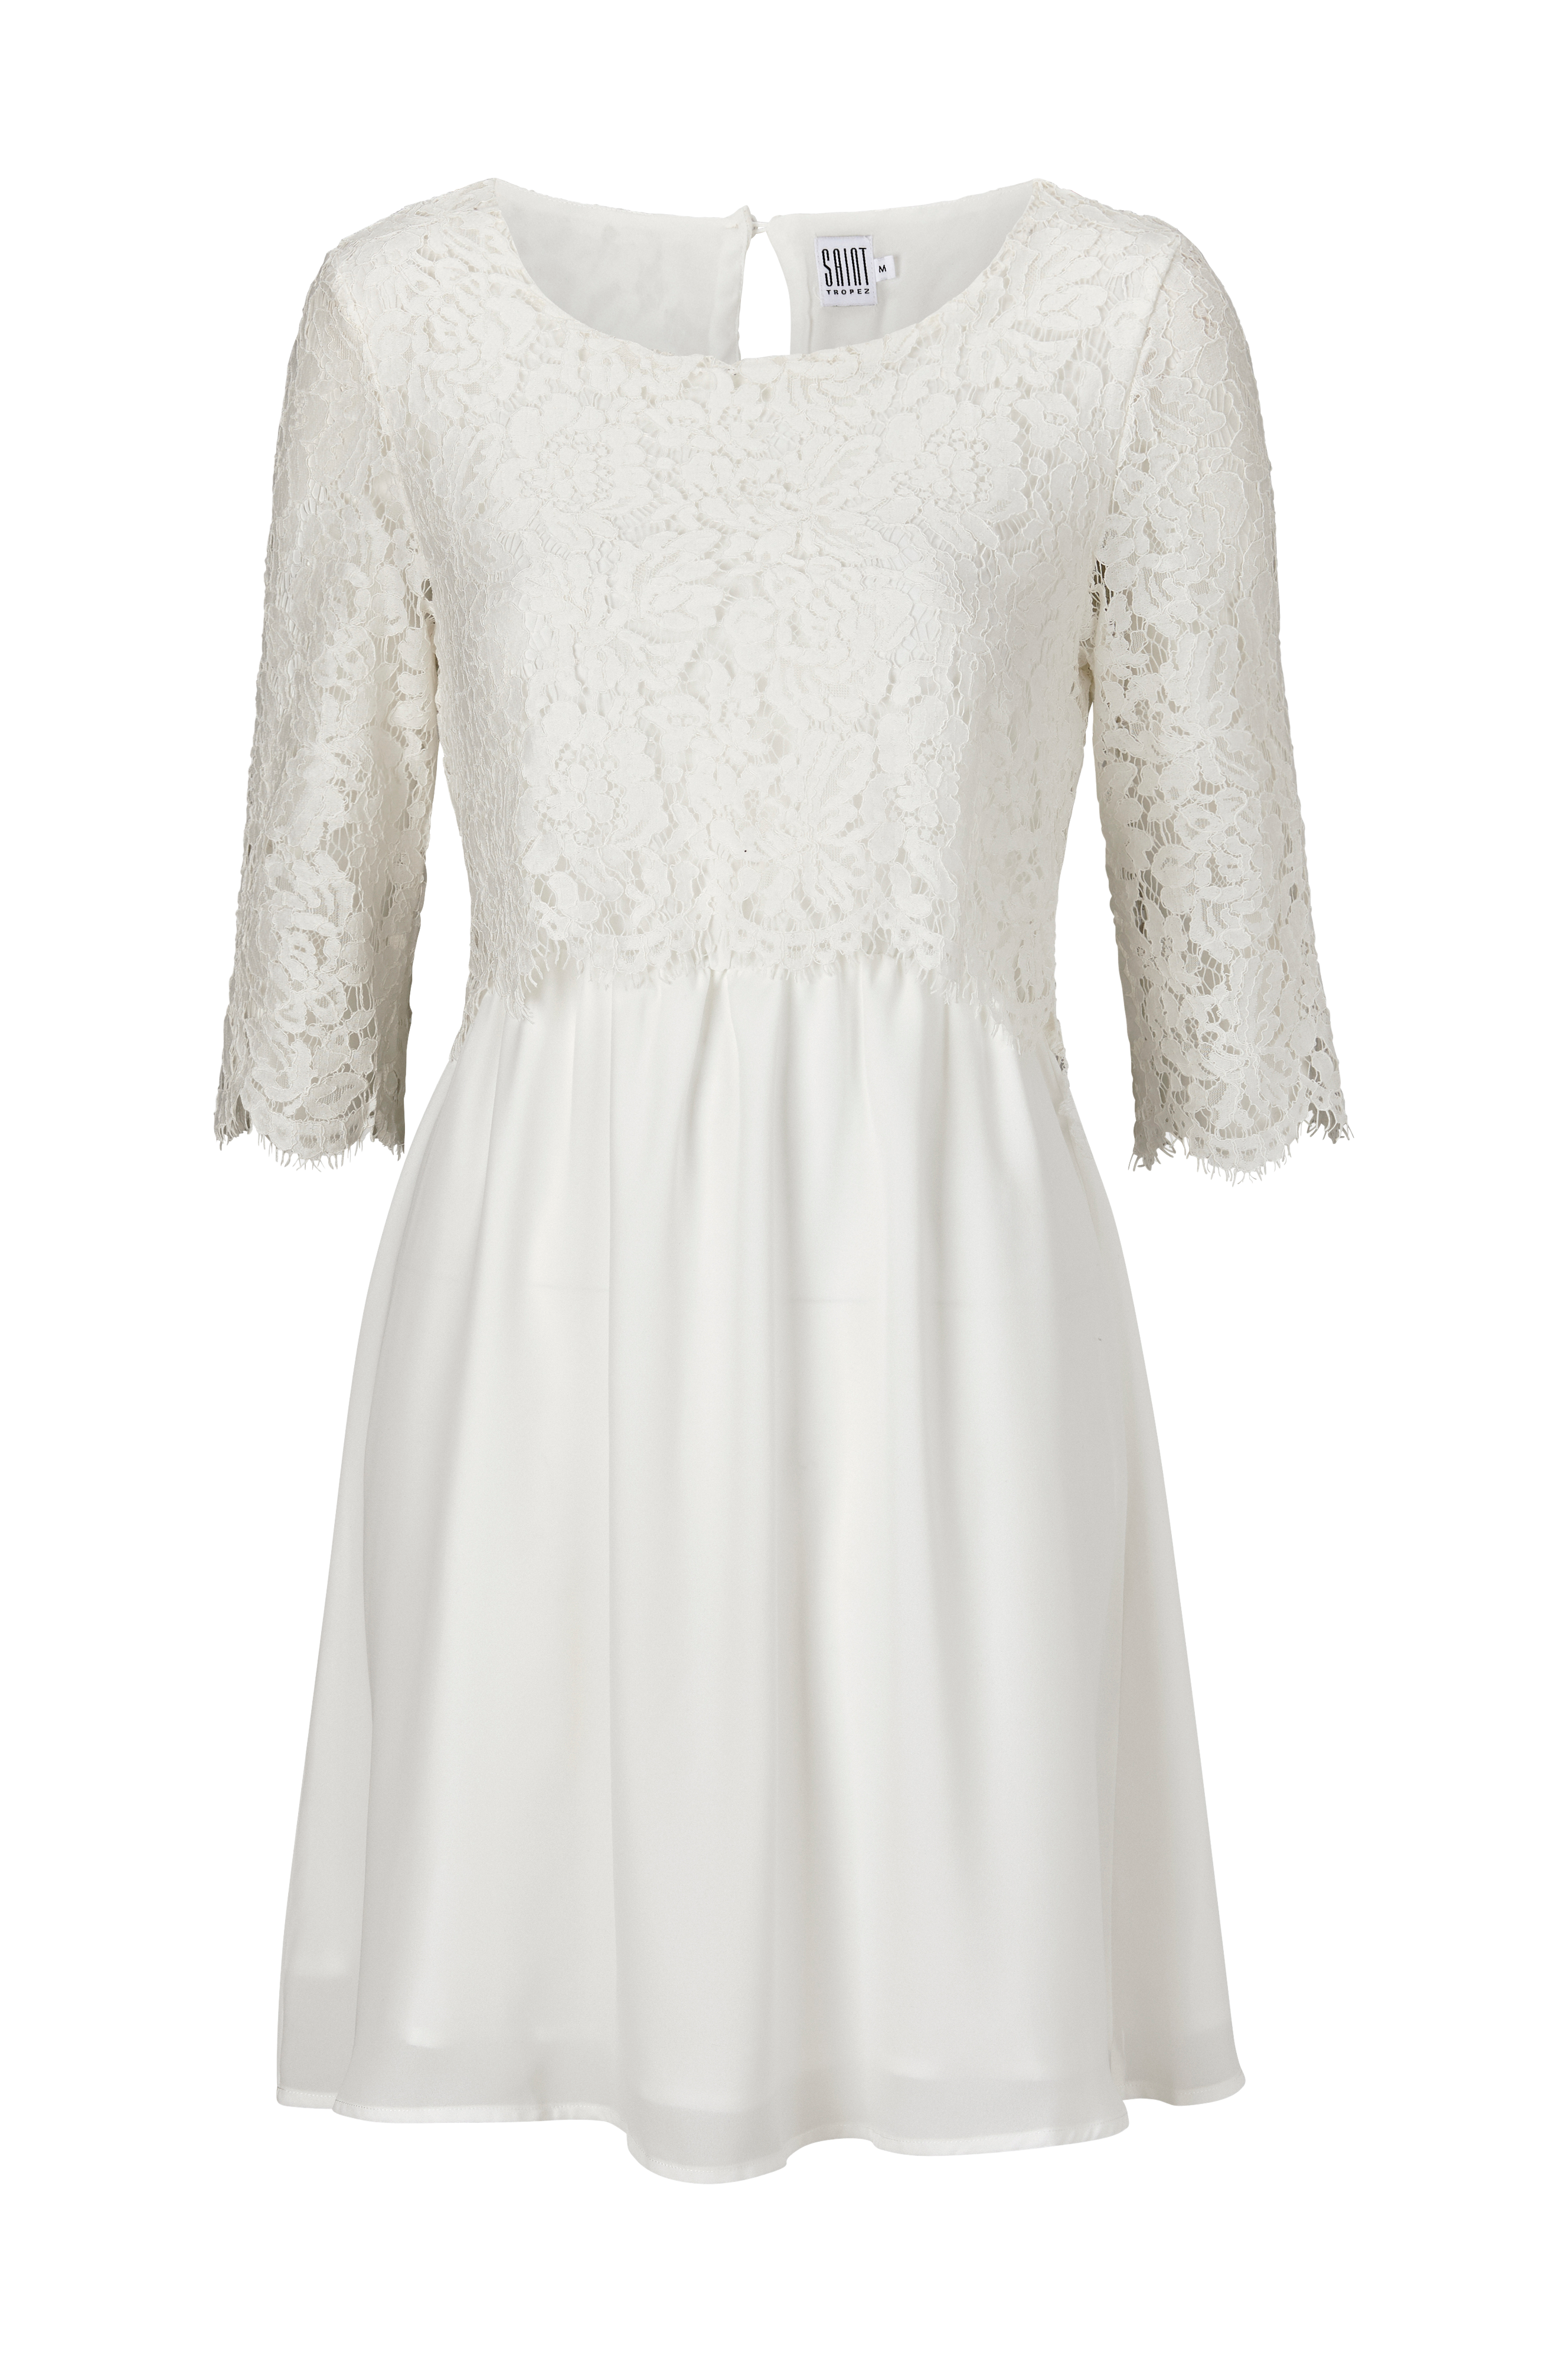 3b0a651f4 Saint Tropez Kjole Party Dress W Lace - Hvid - Dame - Ellos.dk